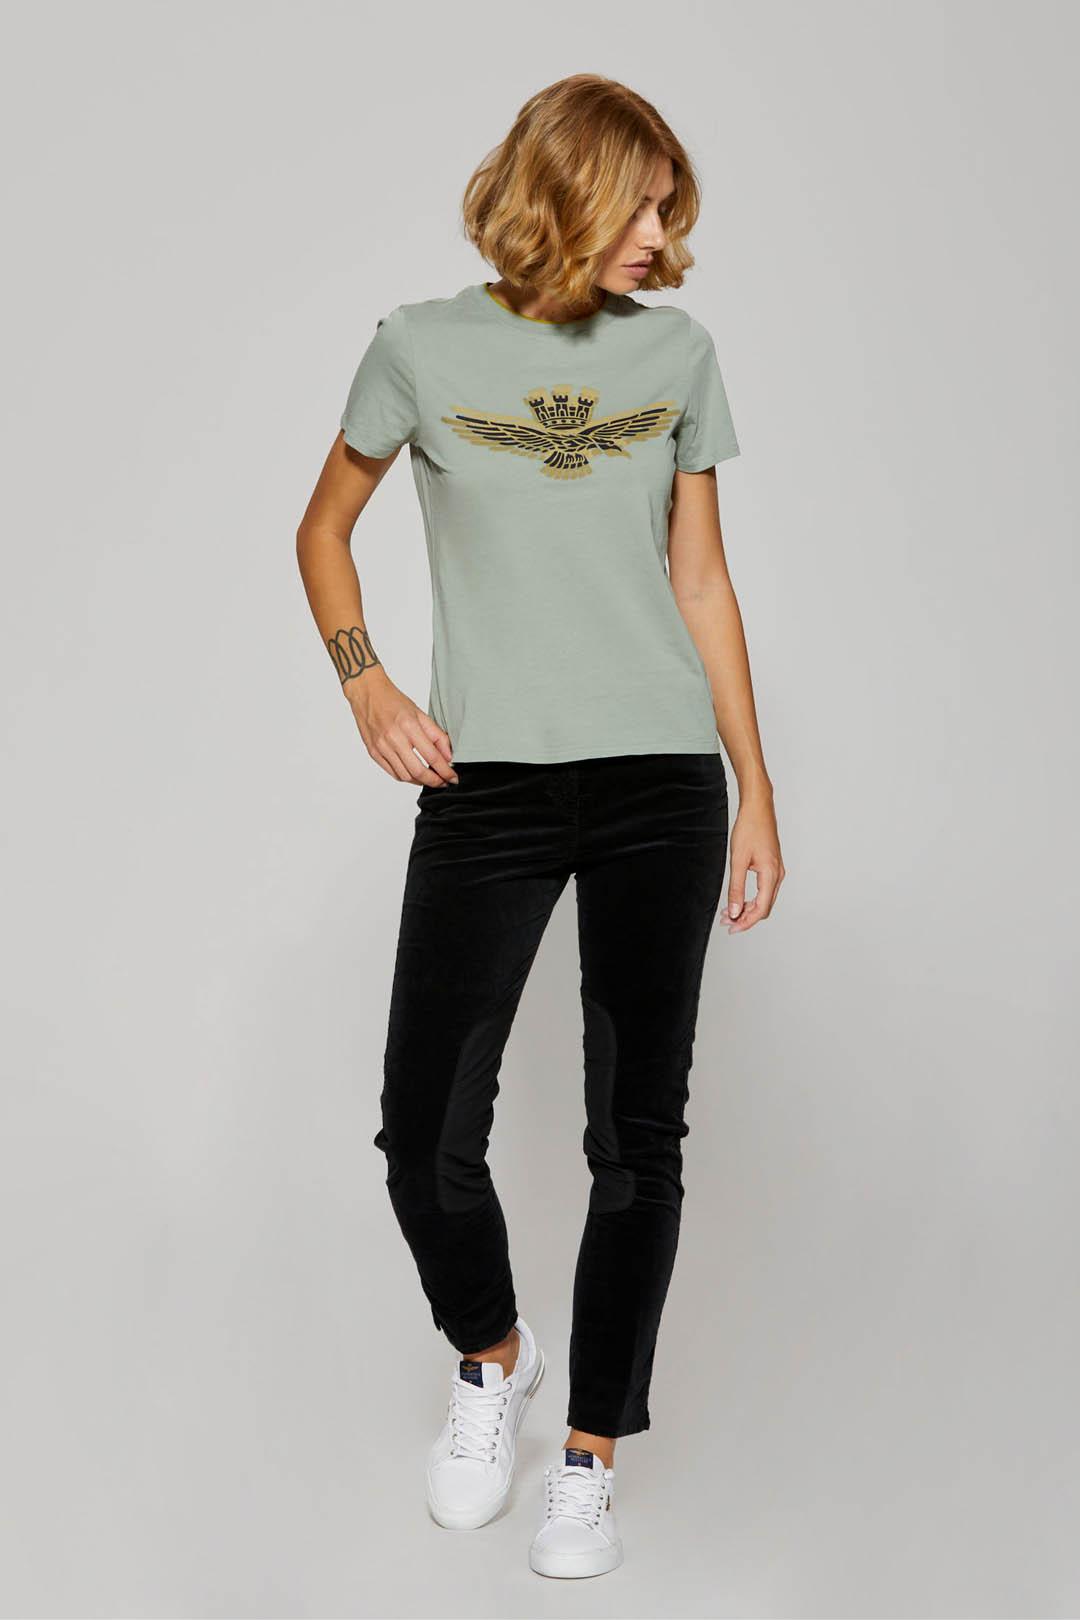 5-pockets velvet trousers with satin     4